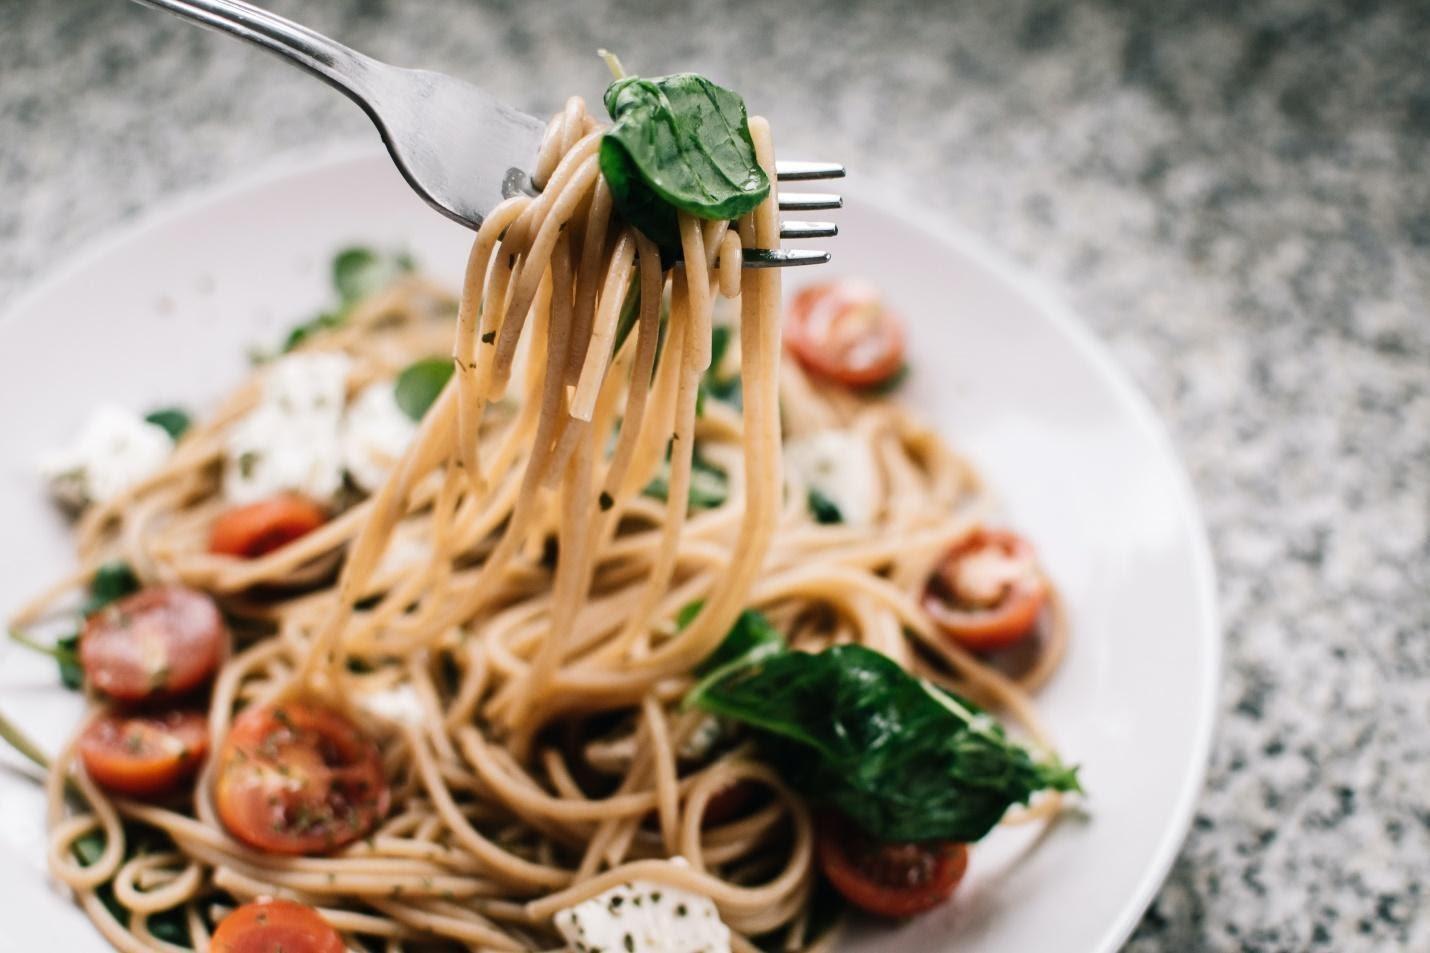 Spaghetti with Salad